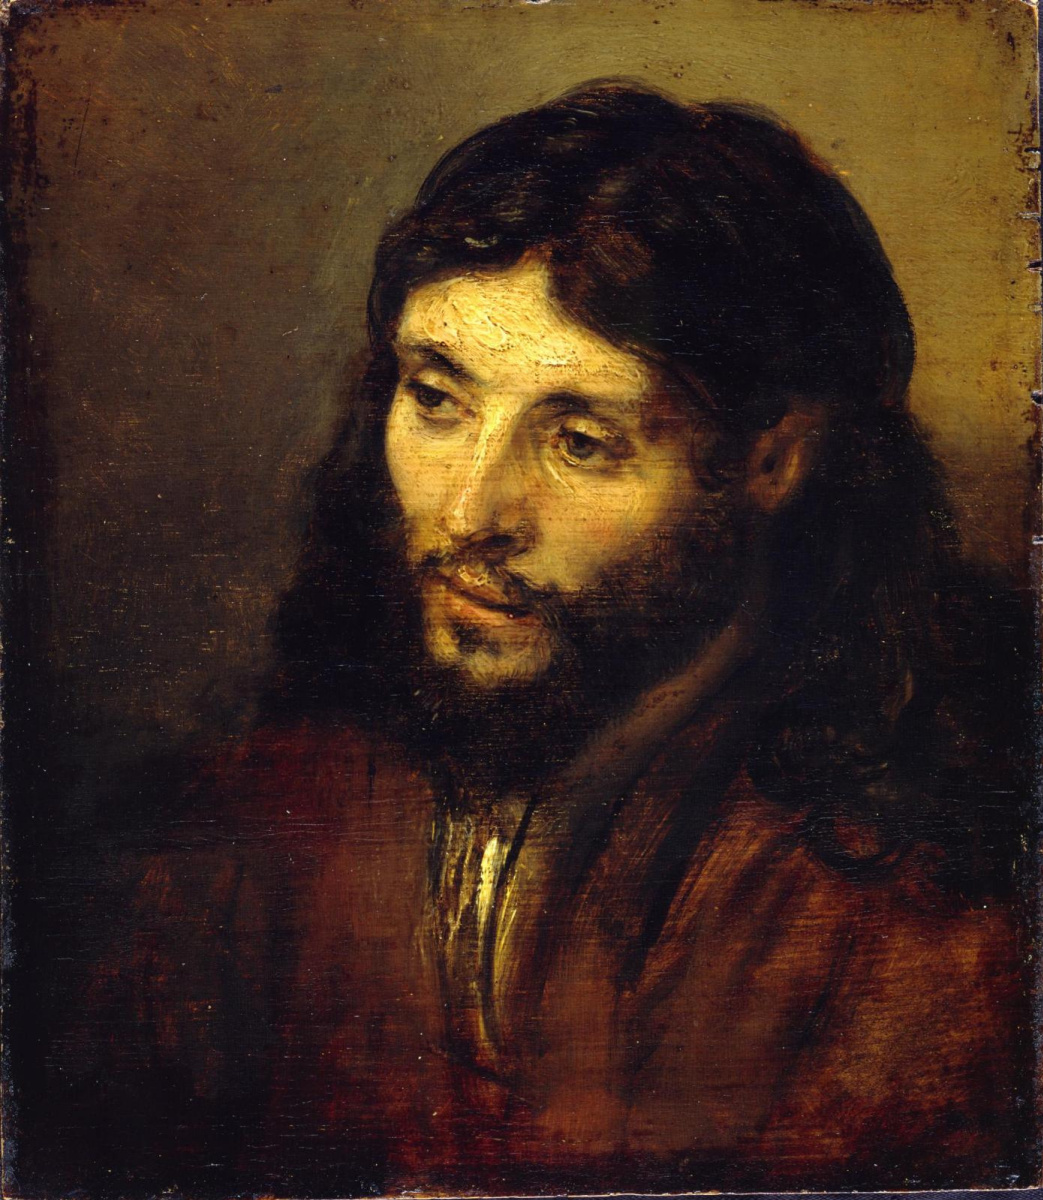 Рембрандт Харменс ван Рейн. Голова Христа